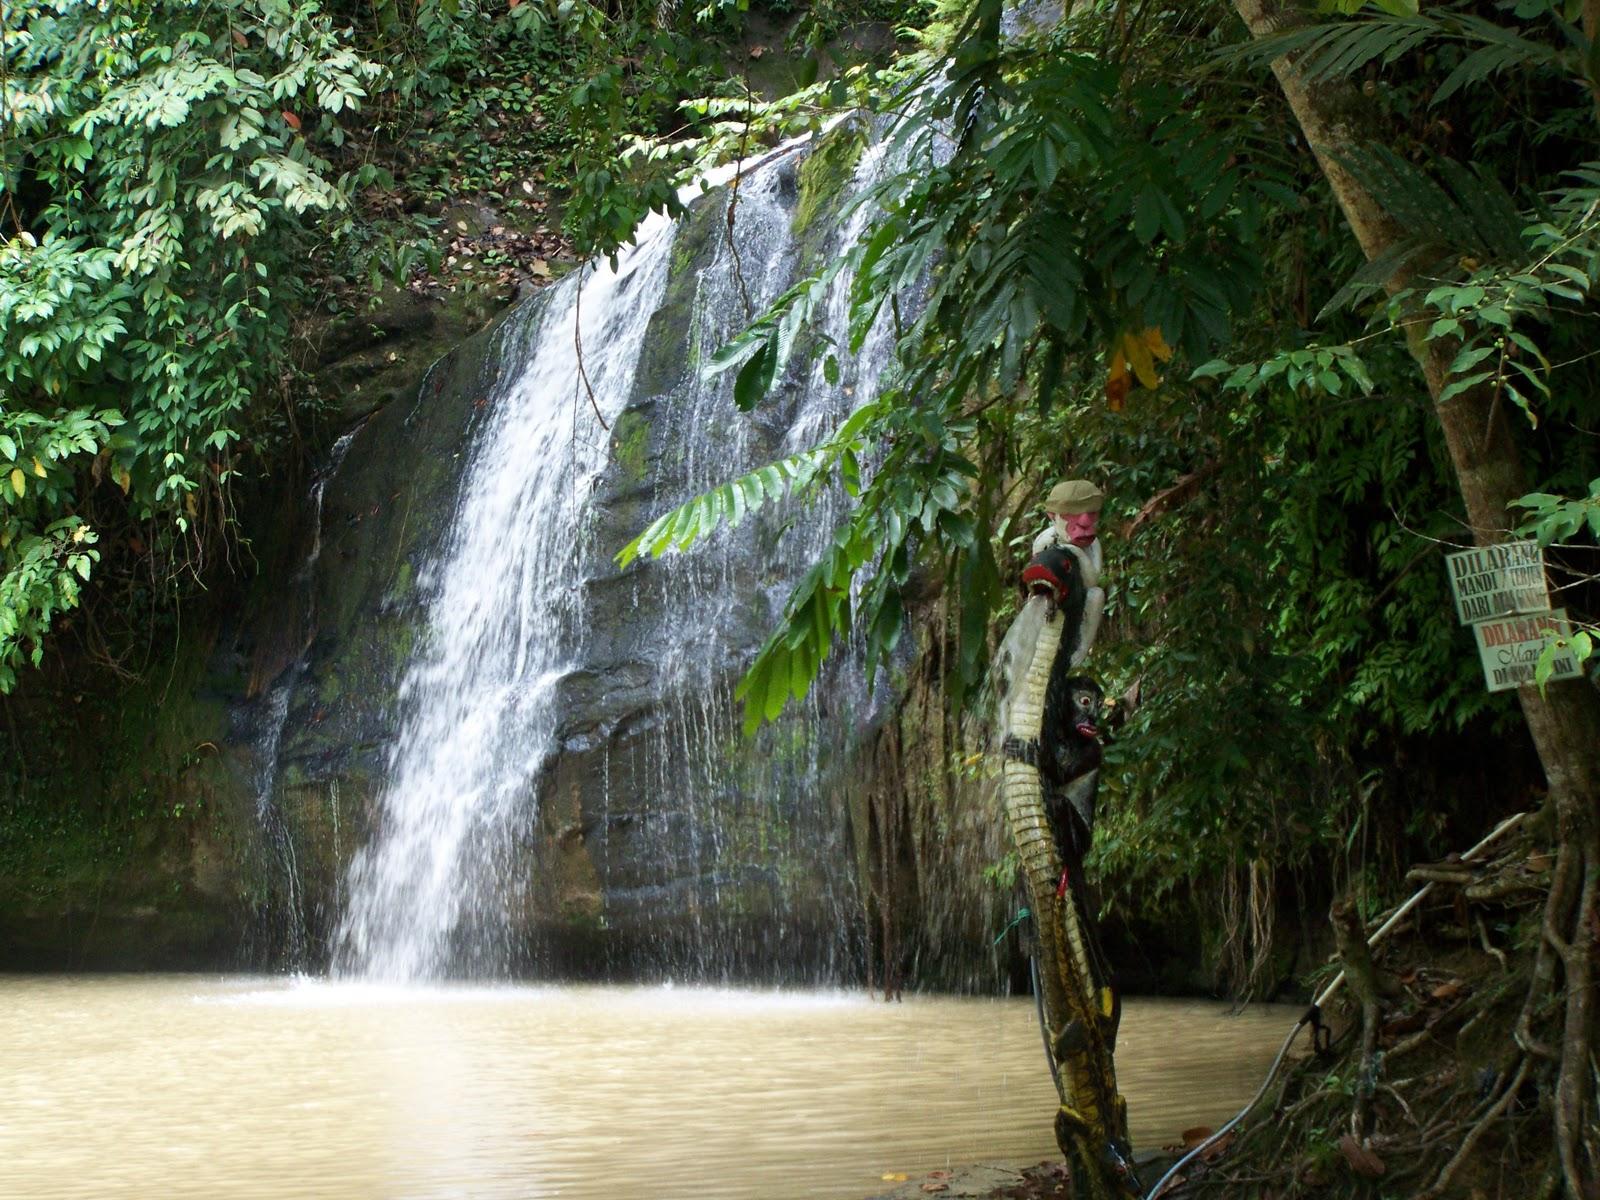 Air Terjun Tanah Merah Kealamian Indah Kalimantan Timur Dunia Jungle